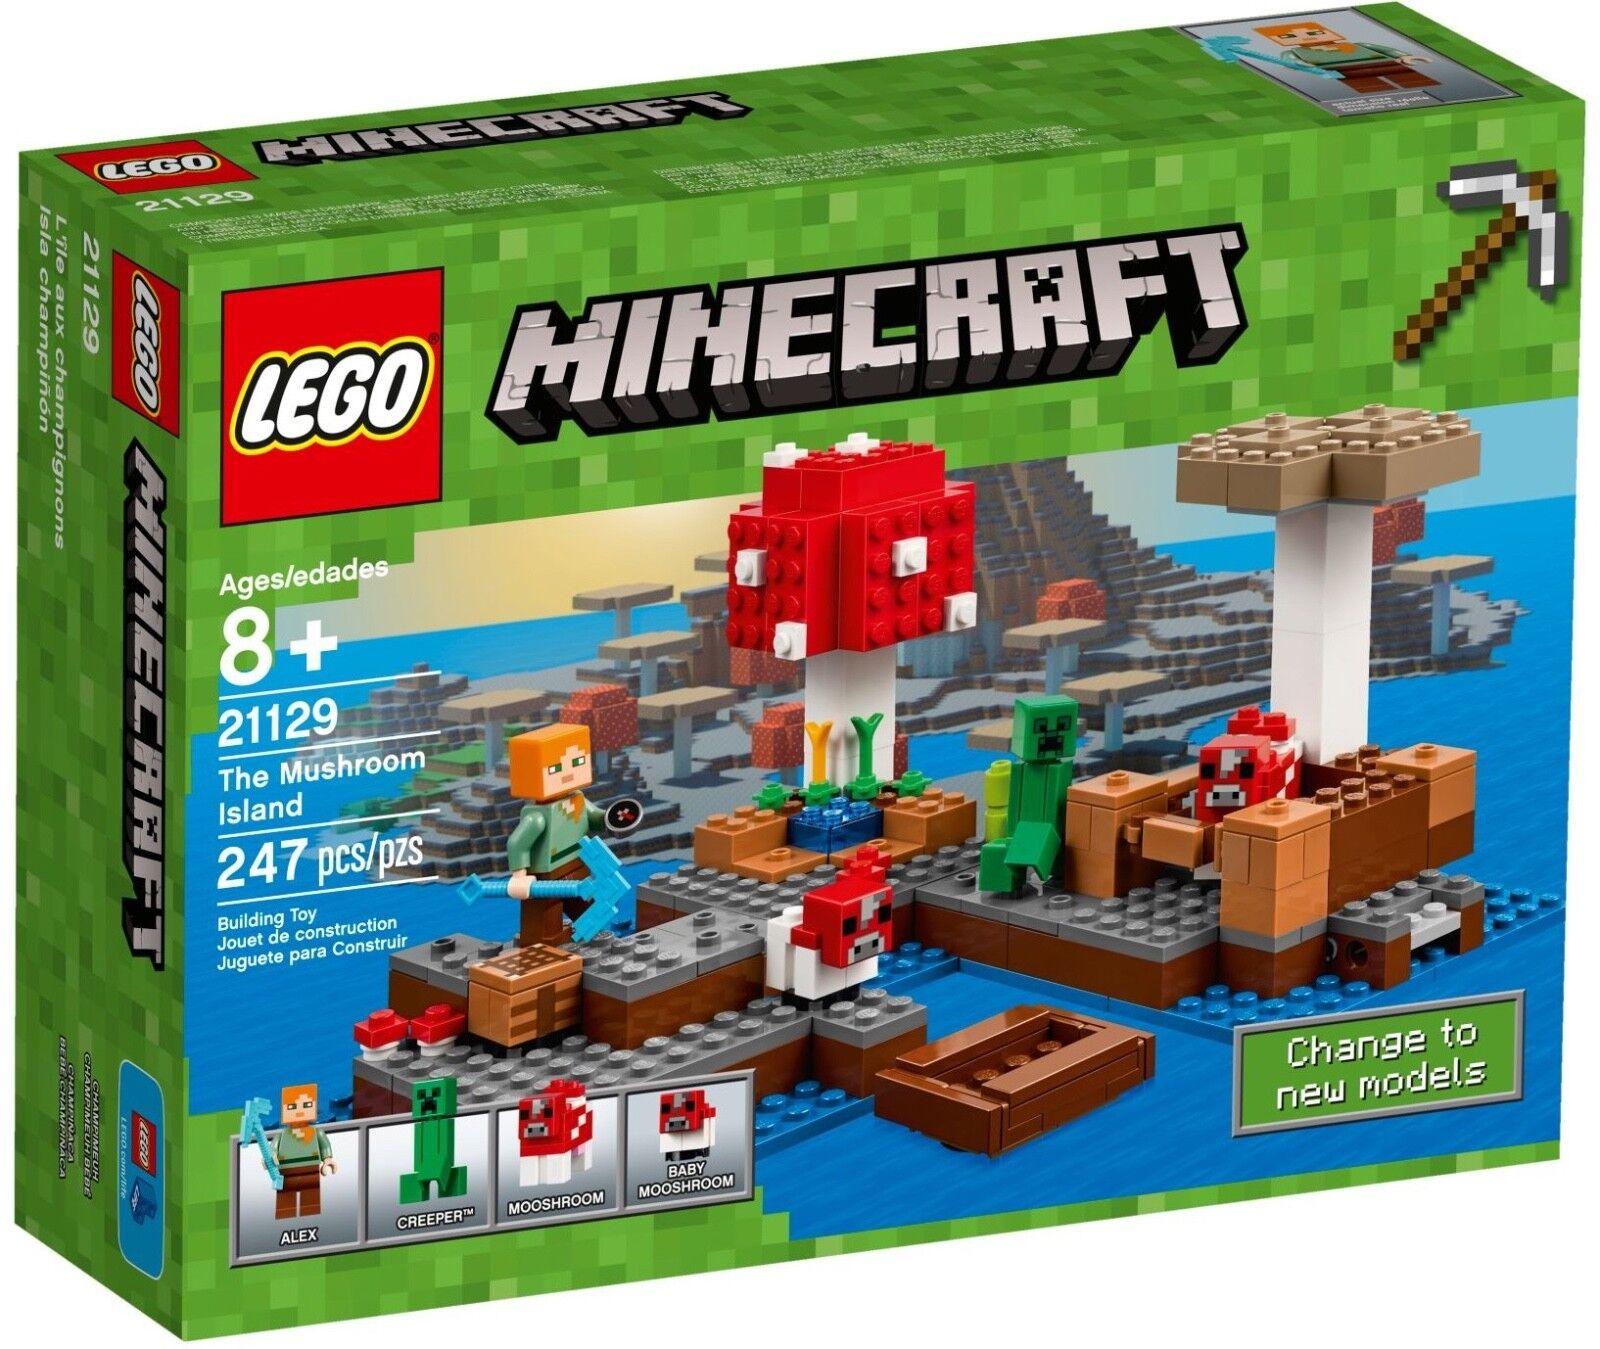 LEGO Minecraft - The Mushroom Island (21129)